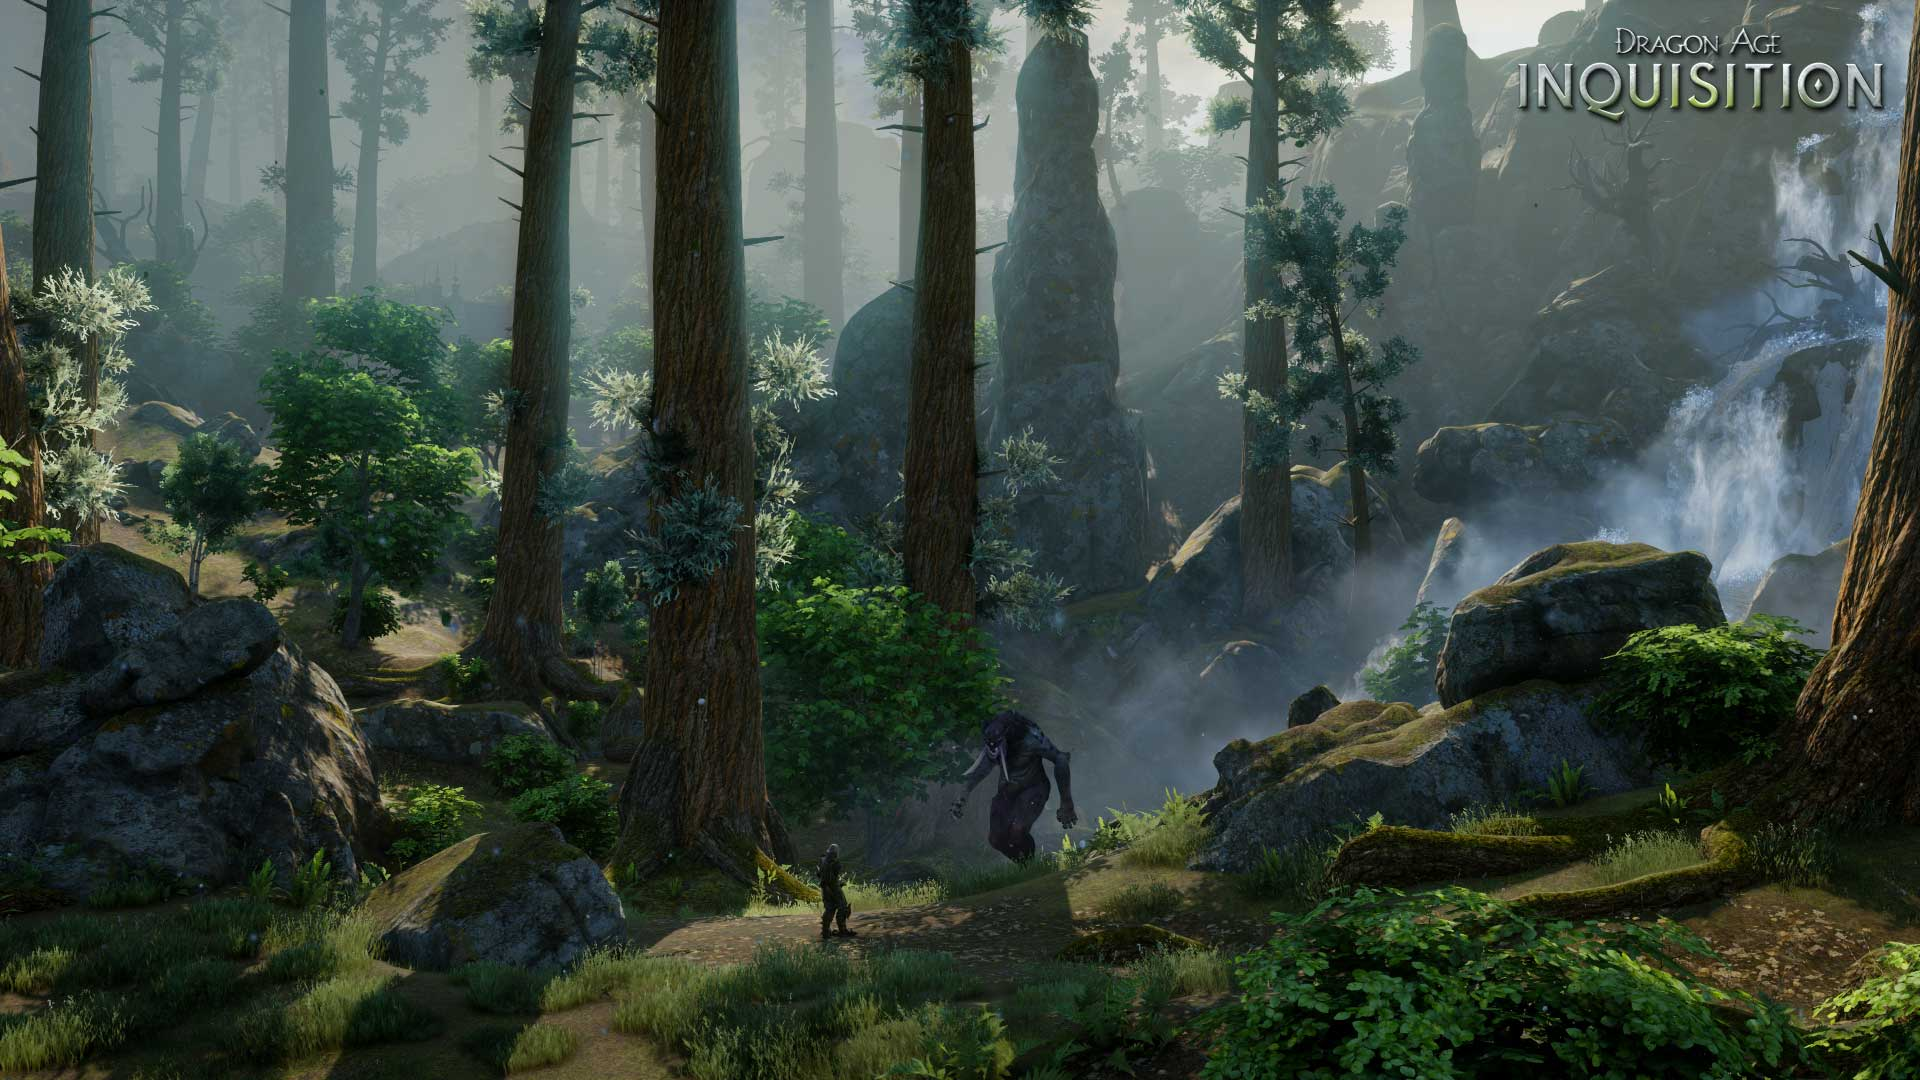 dragon age inquisition ForestGiant_WM_web